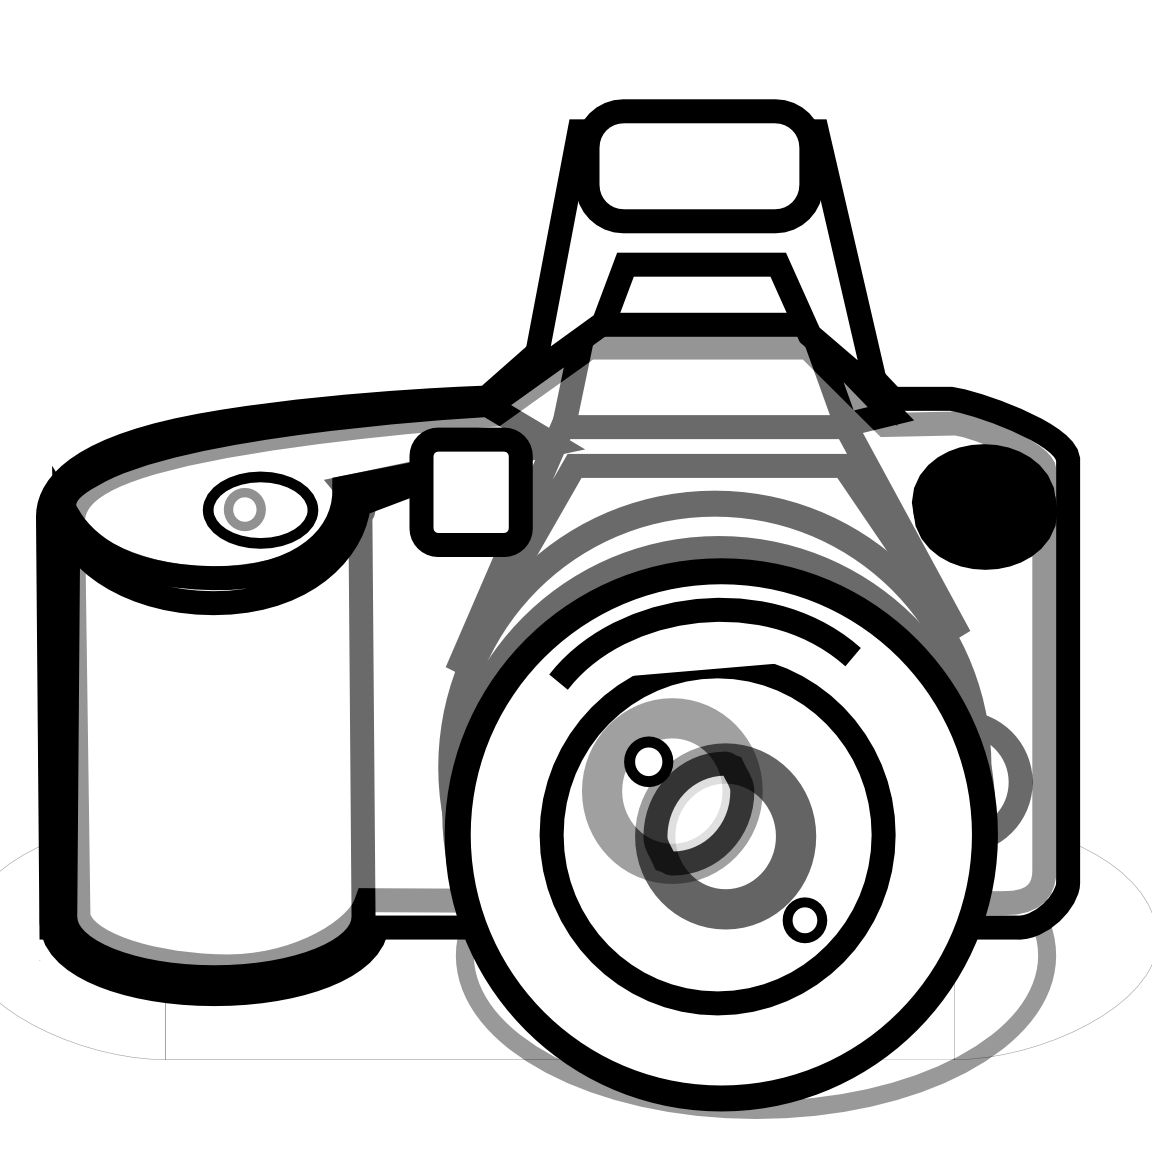 Digital Camera Clipart Black And White.